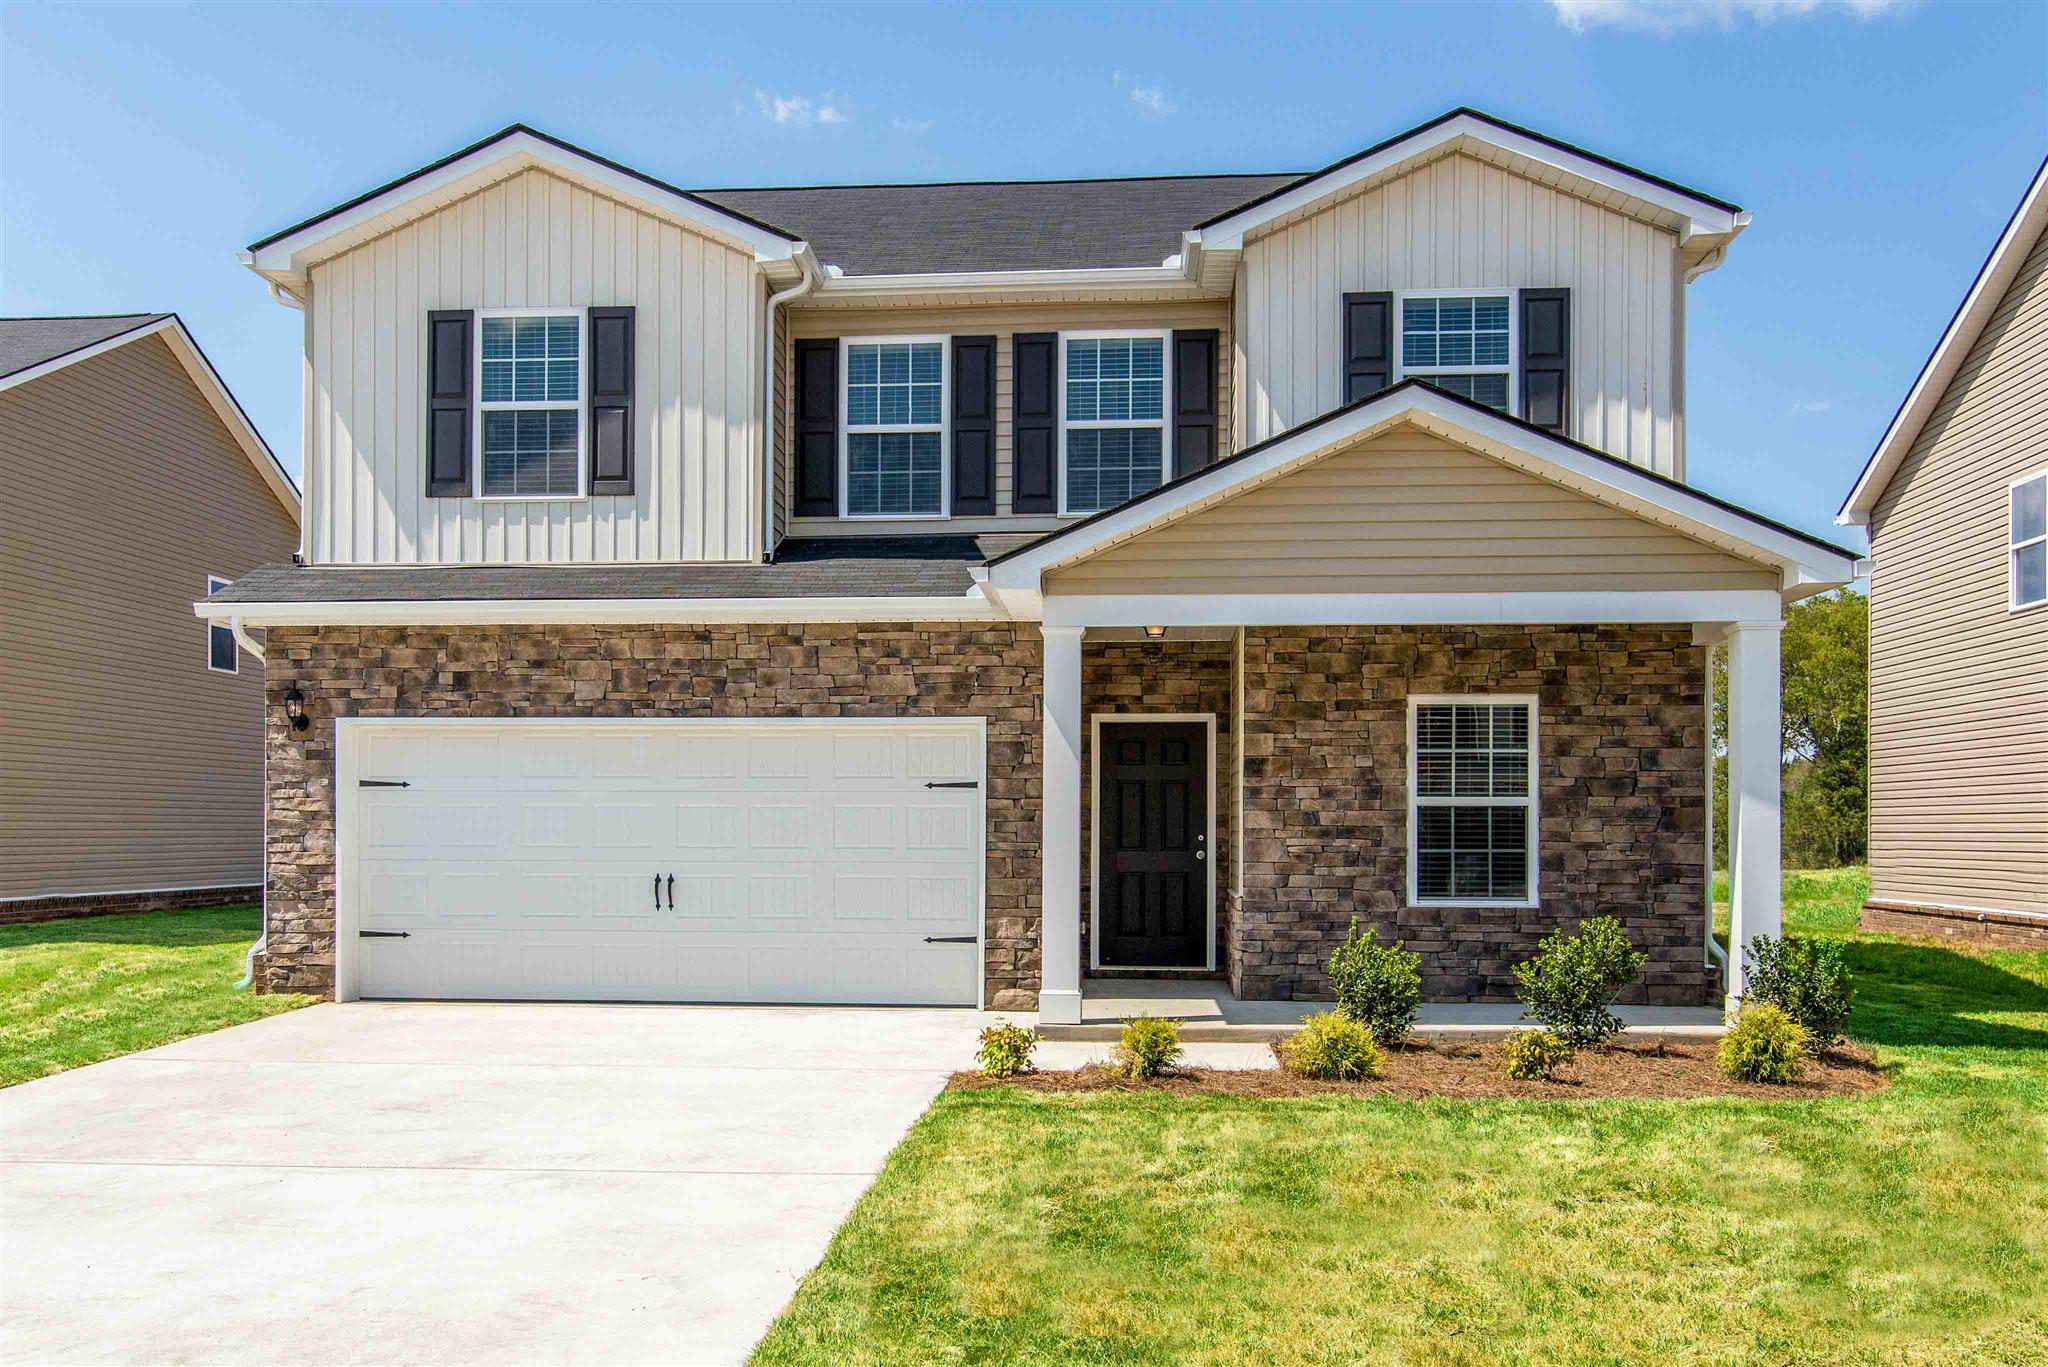 3441 Pitchers Lane, Murfreesboro, TN 37128